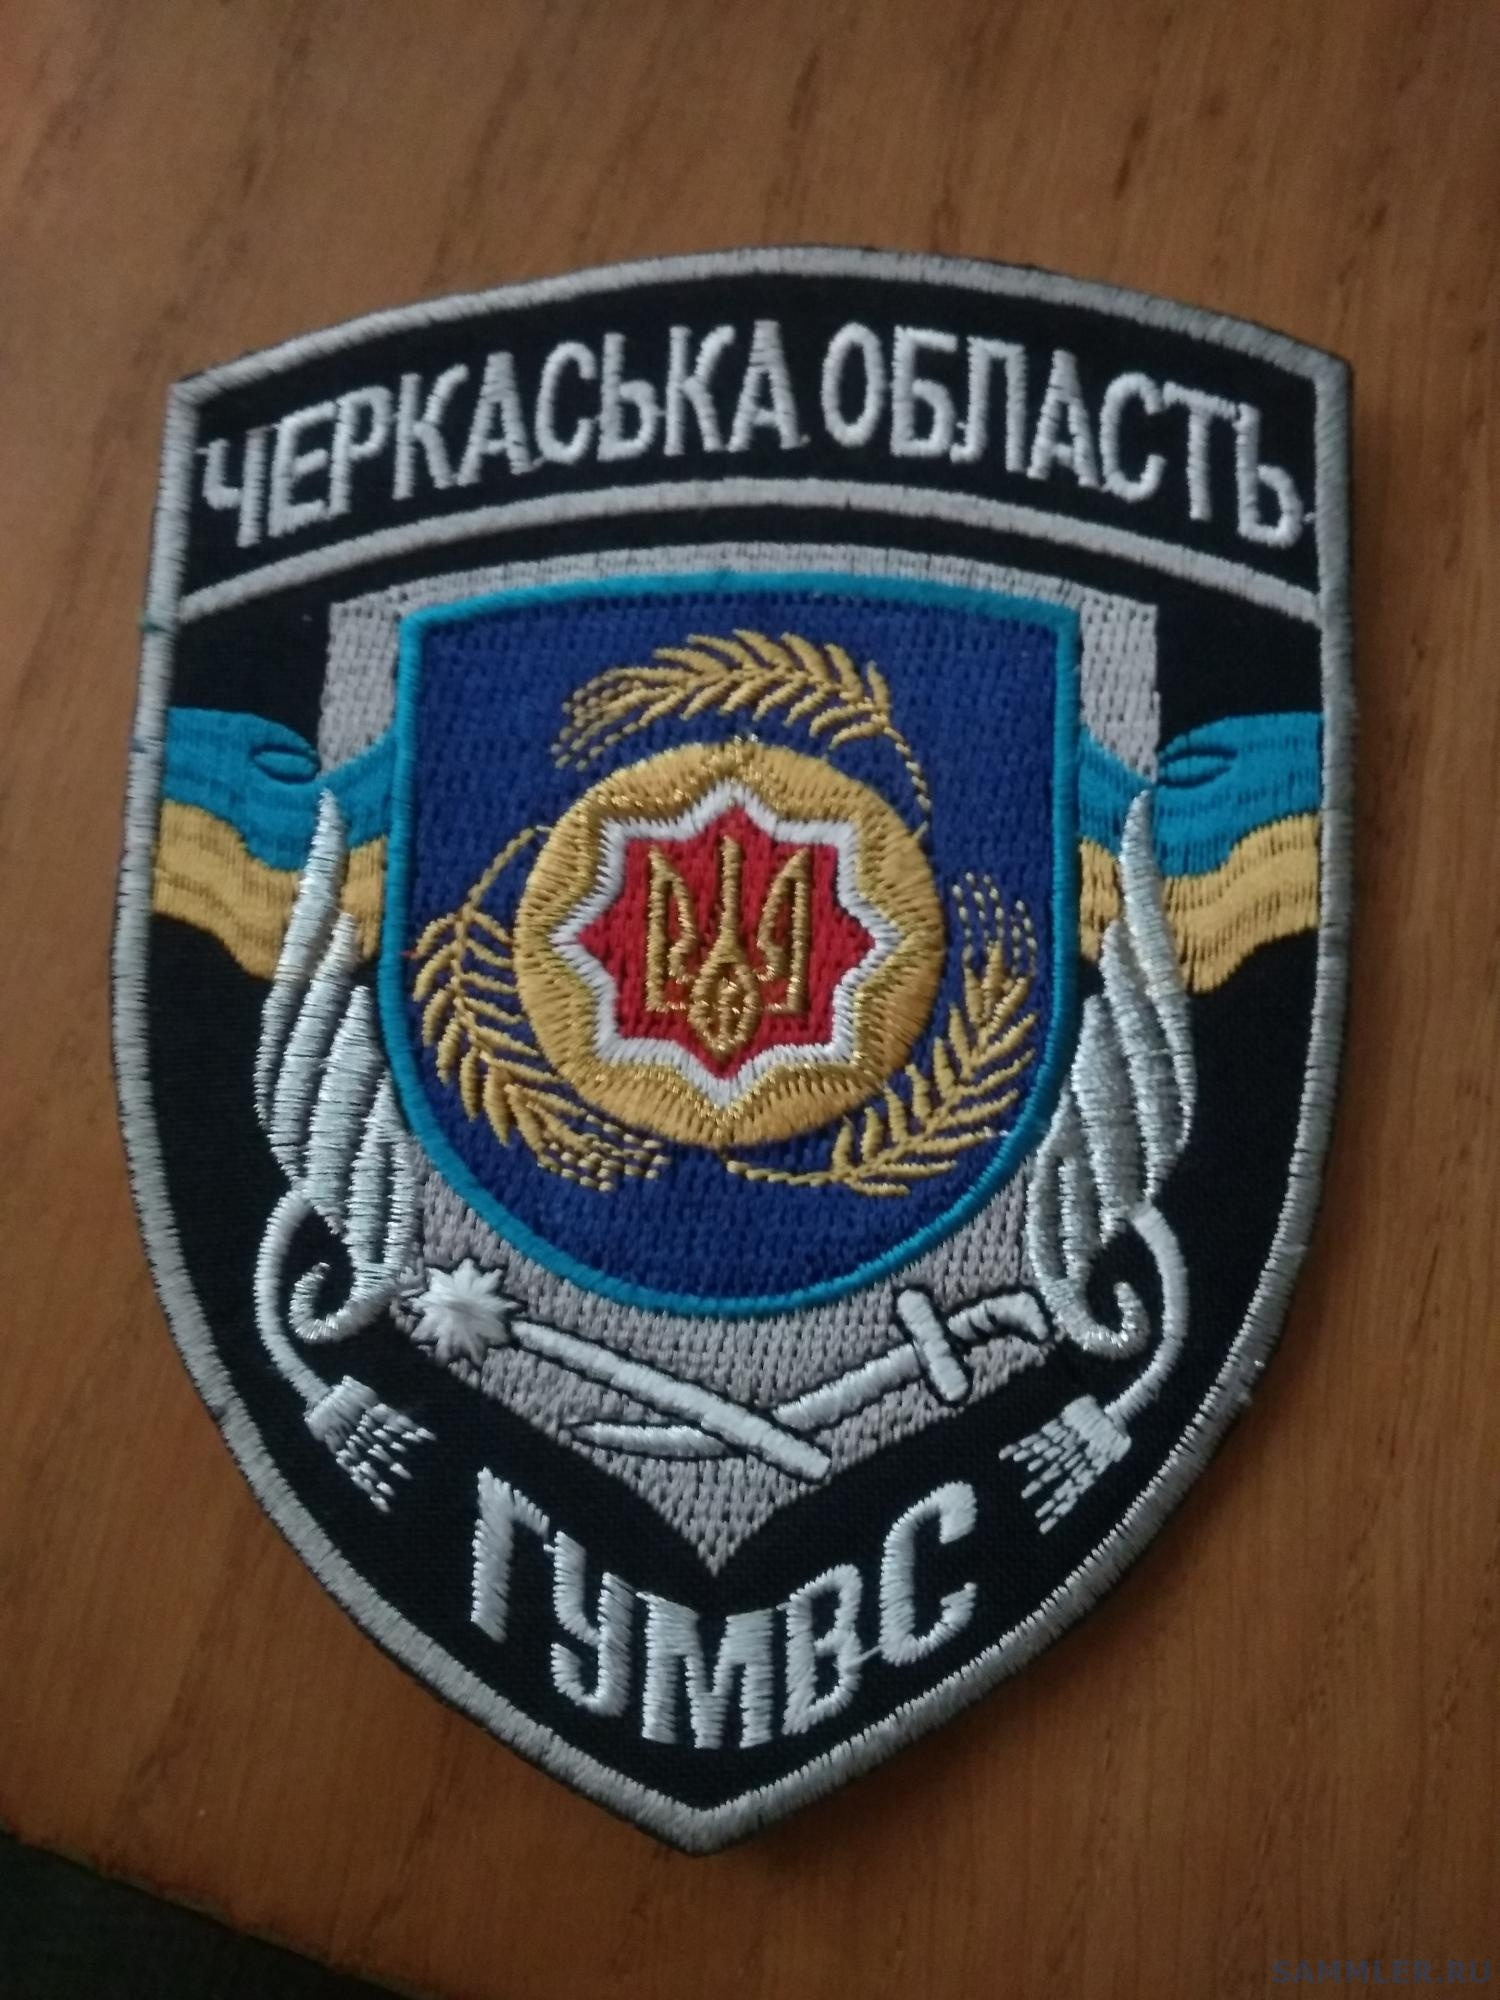 IMG_20200106_105841.jpg